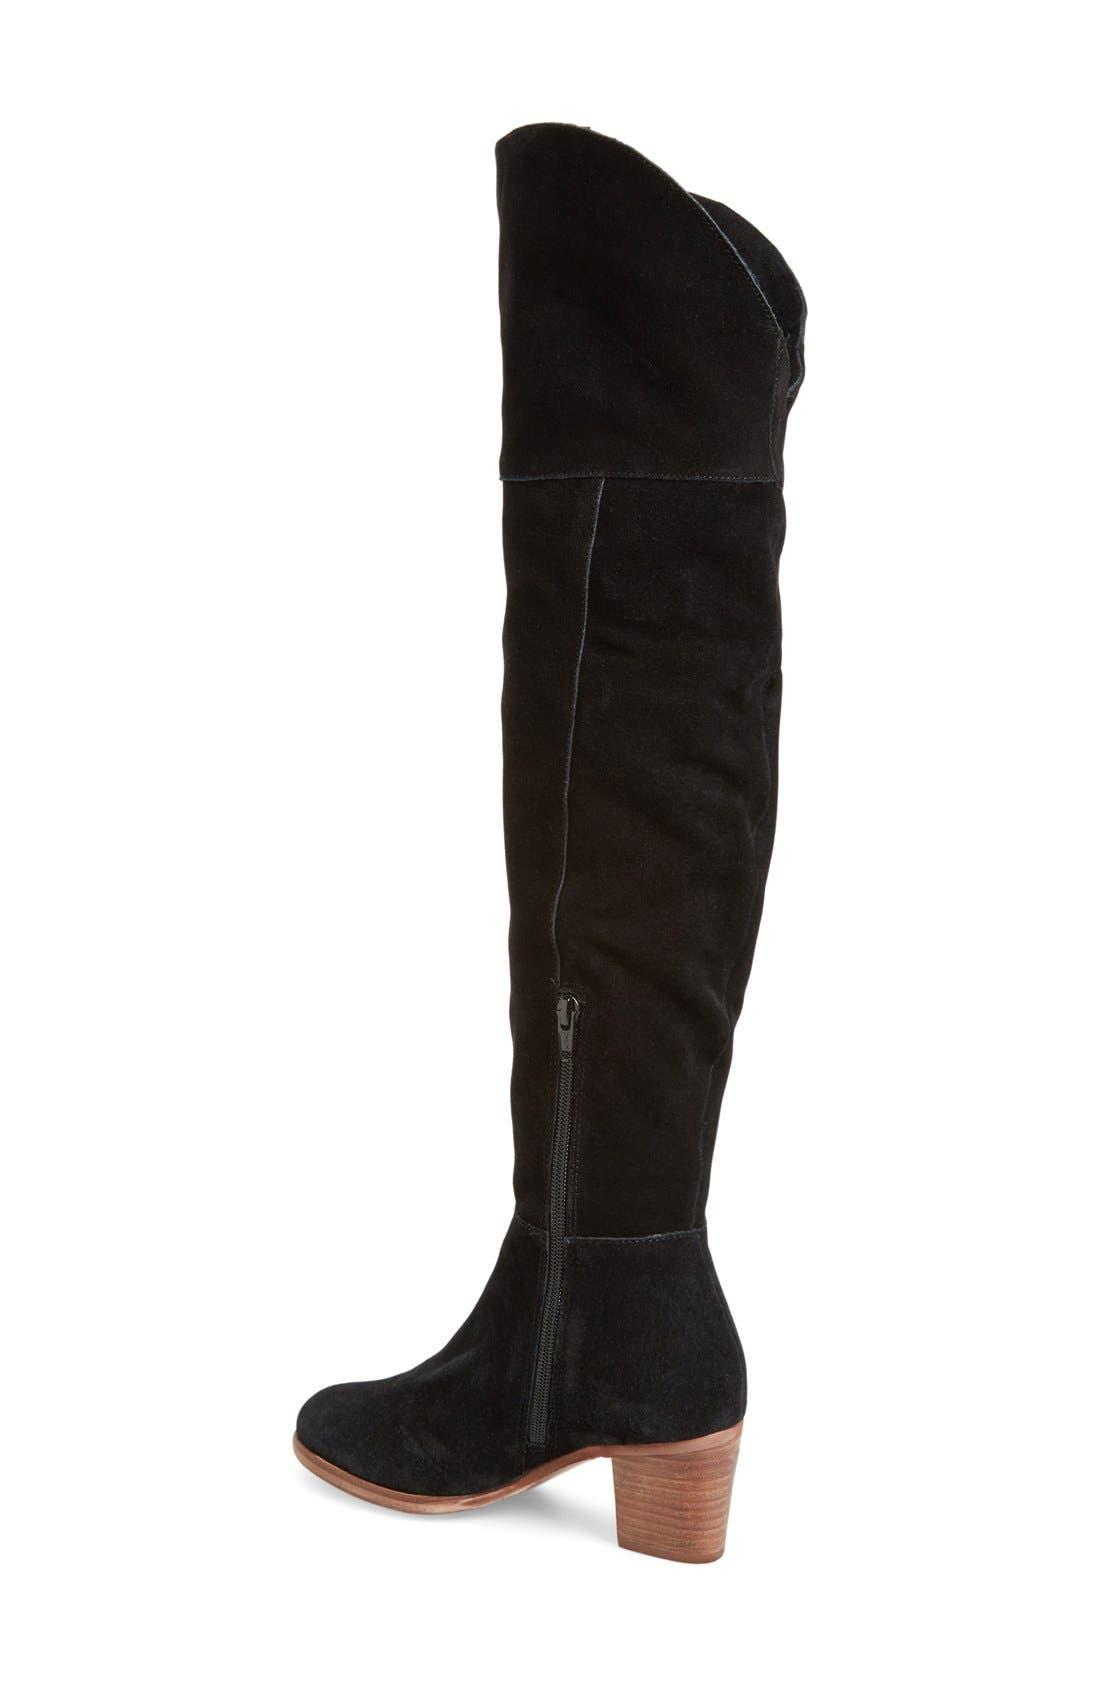 Alternate Image 2  - Matisse Muse Tall Boot (Women) (Narrow Calf)